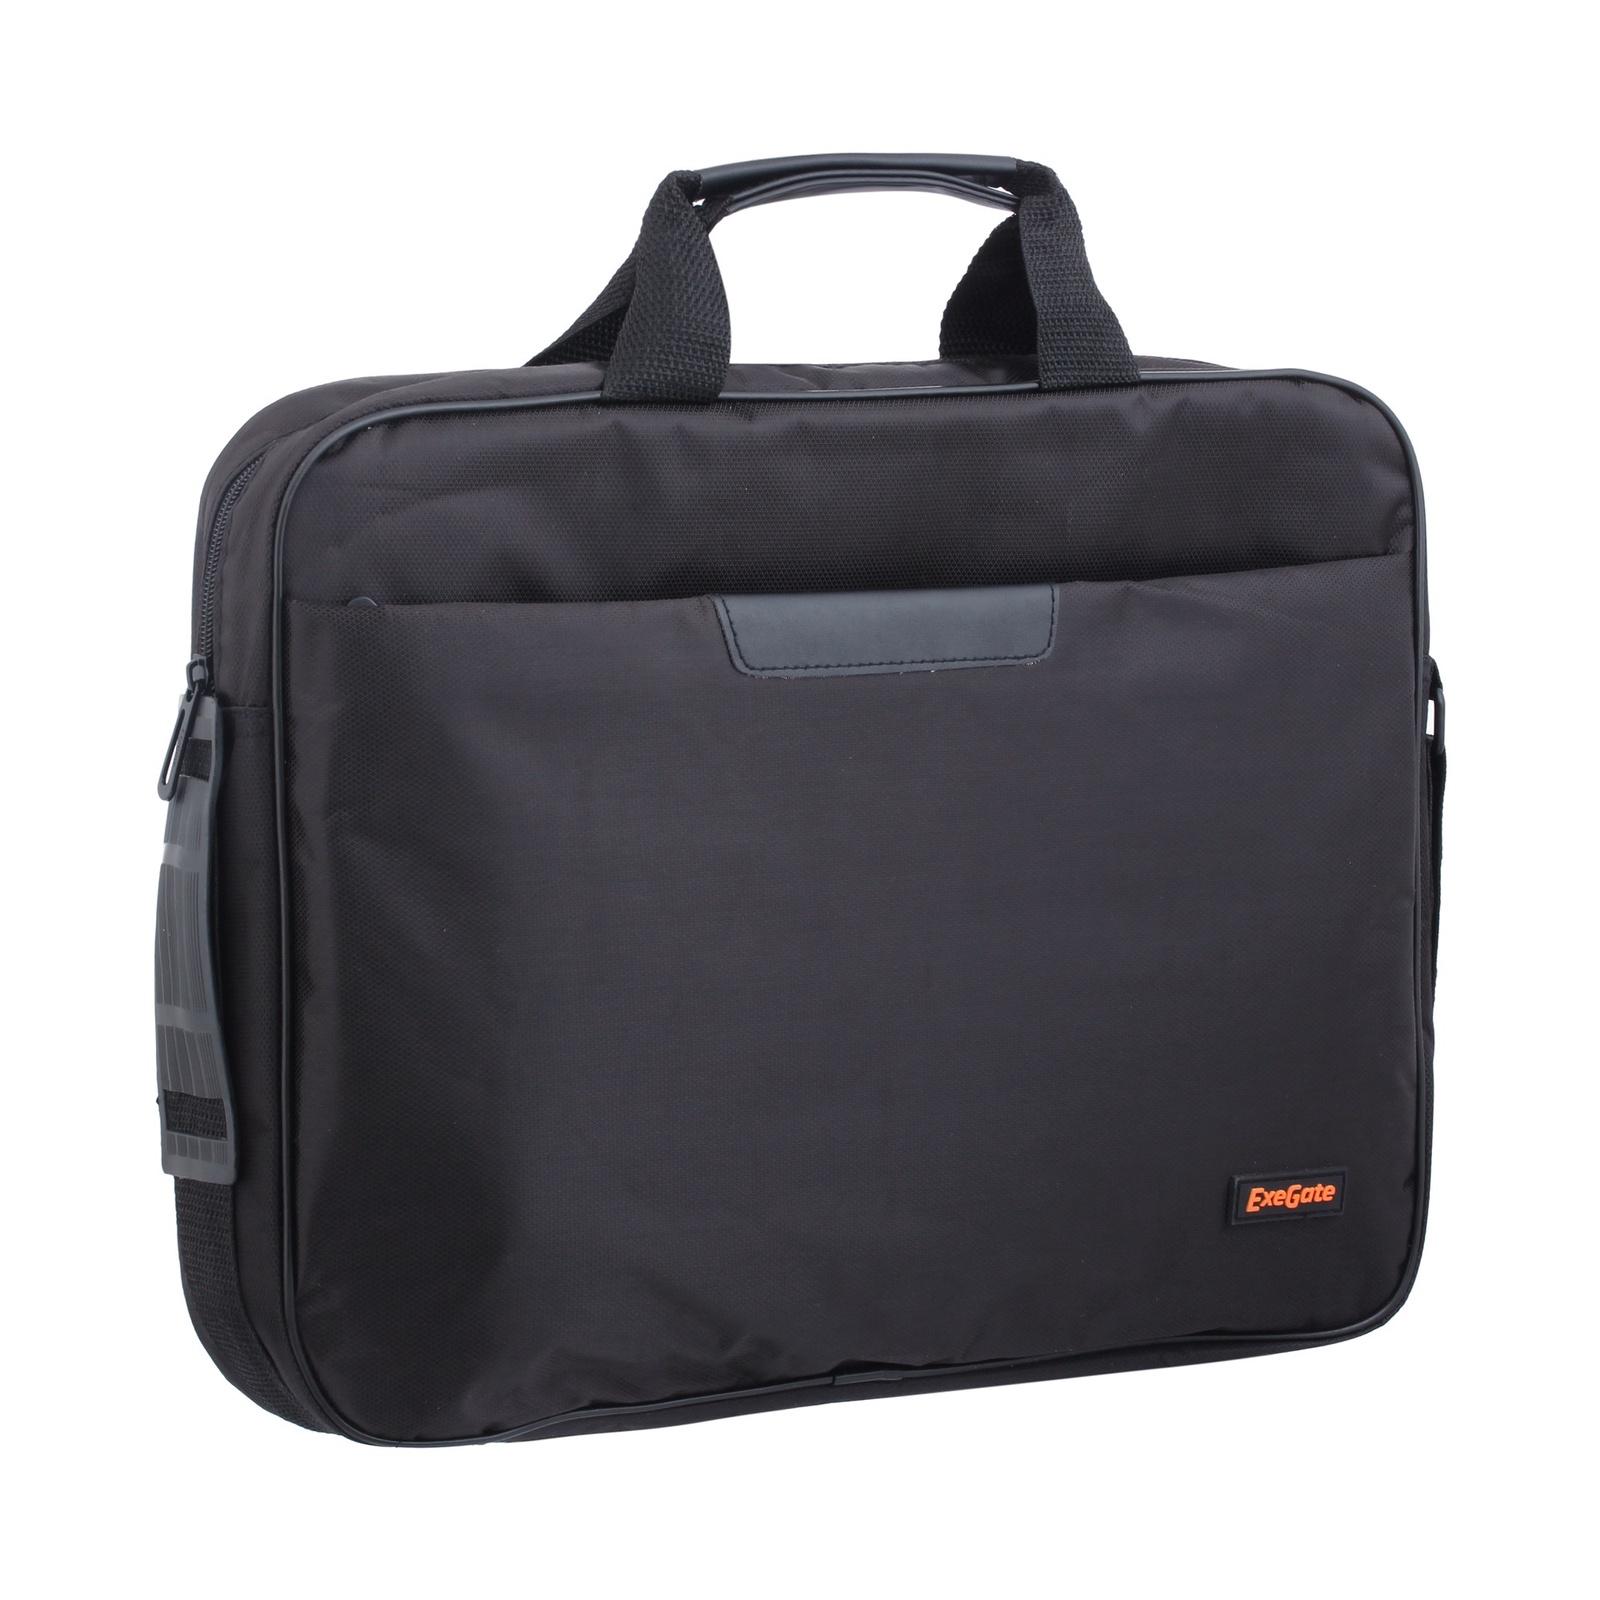 Сумка Exegate Office F1595 Black, черная, полиэстер, для ноутбуков до 15.6 аксессуар сумка 15 6 exegate office f1595 black